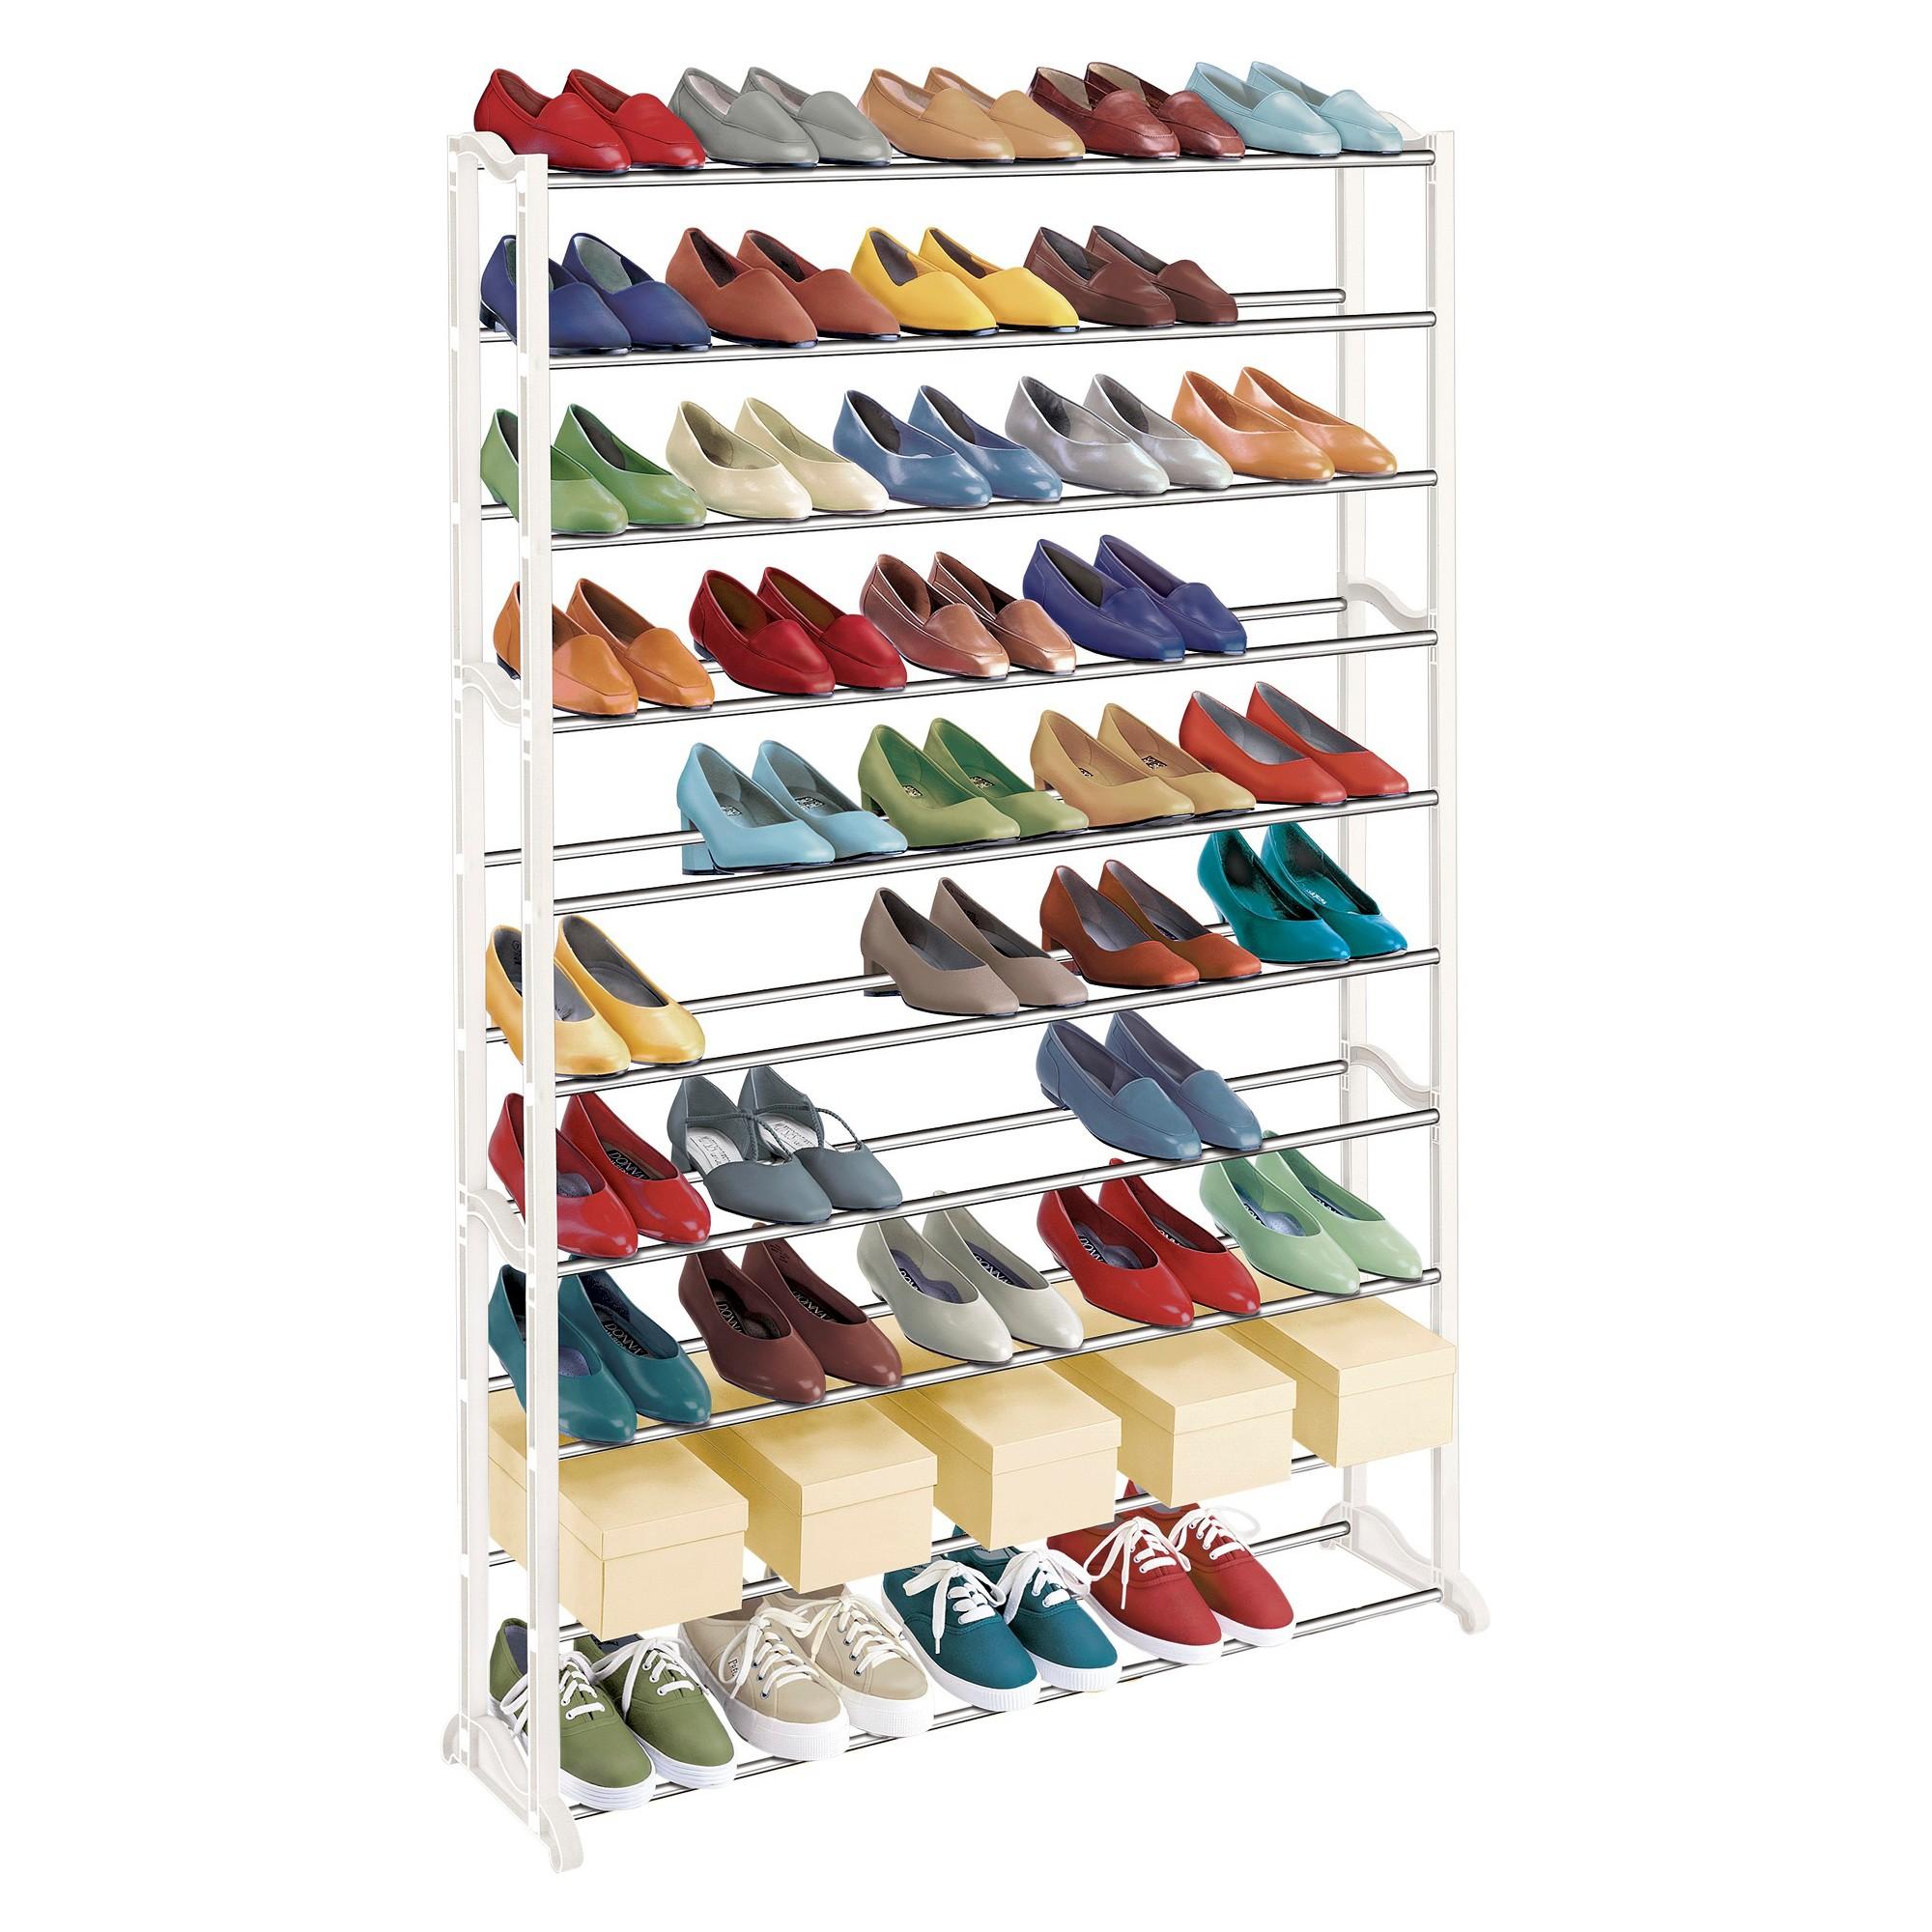 Lynk 50 Pair Shoe Rack - 10 Tier - Shoe Shelf Organizer - White